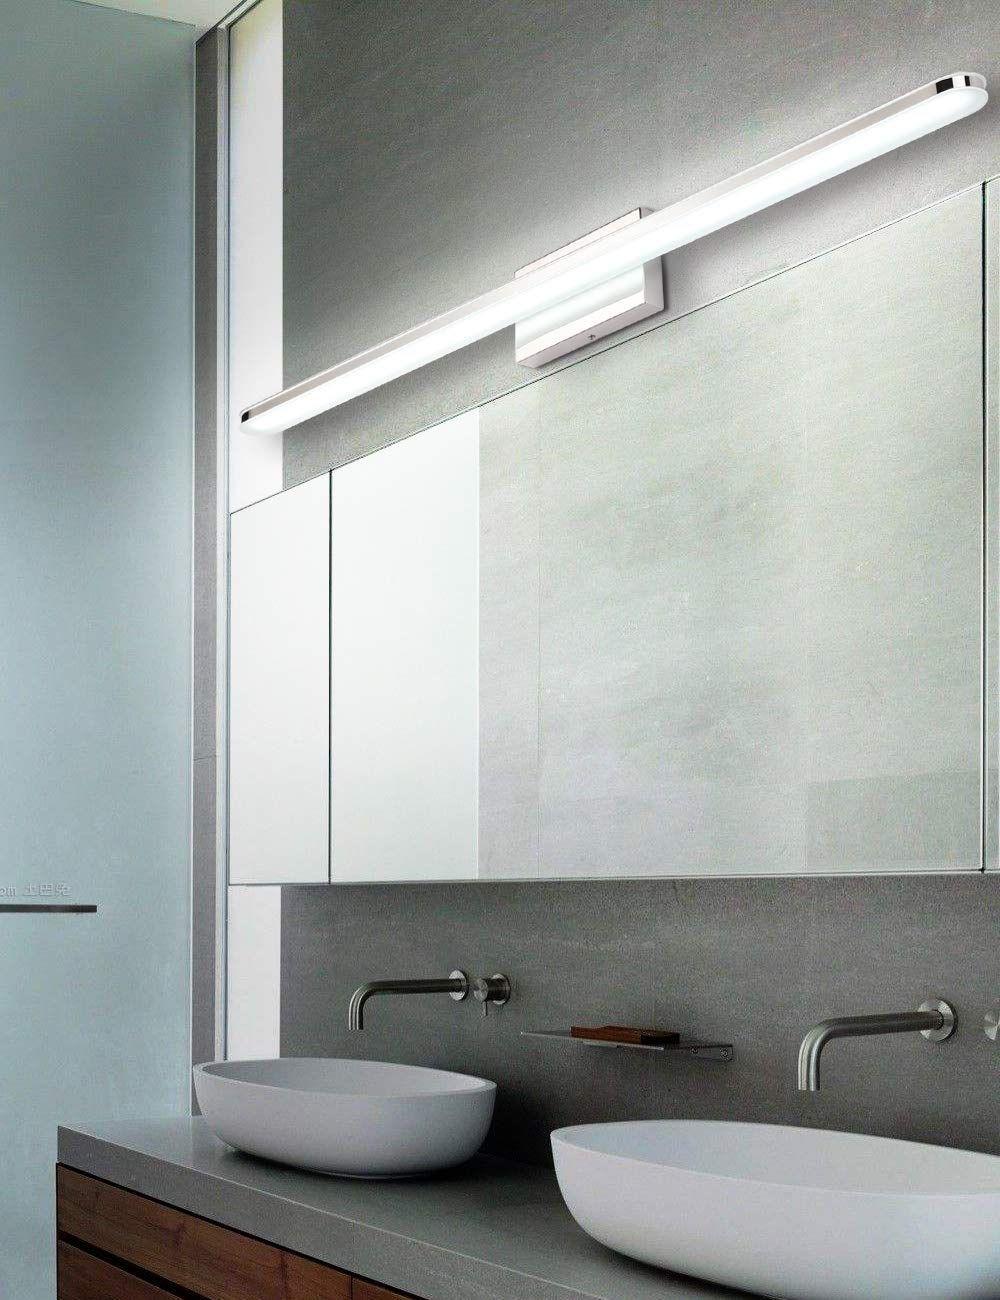 Led 39 4 Inch Bathroom Vanity Lighting Fixtures Stainless Steel